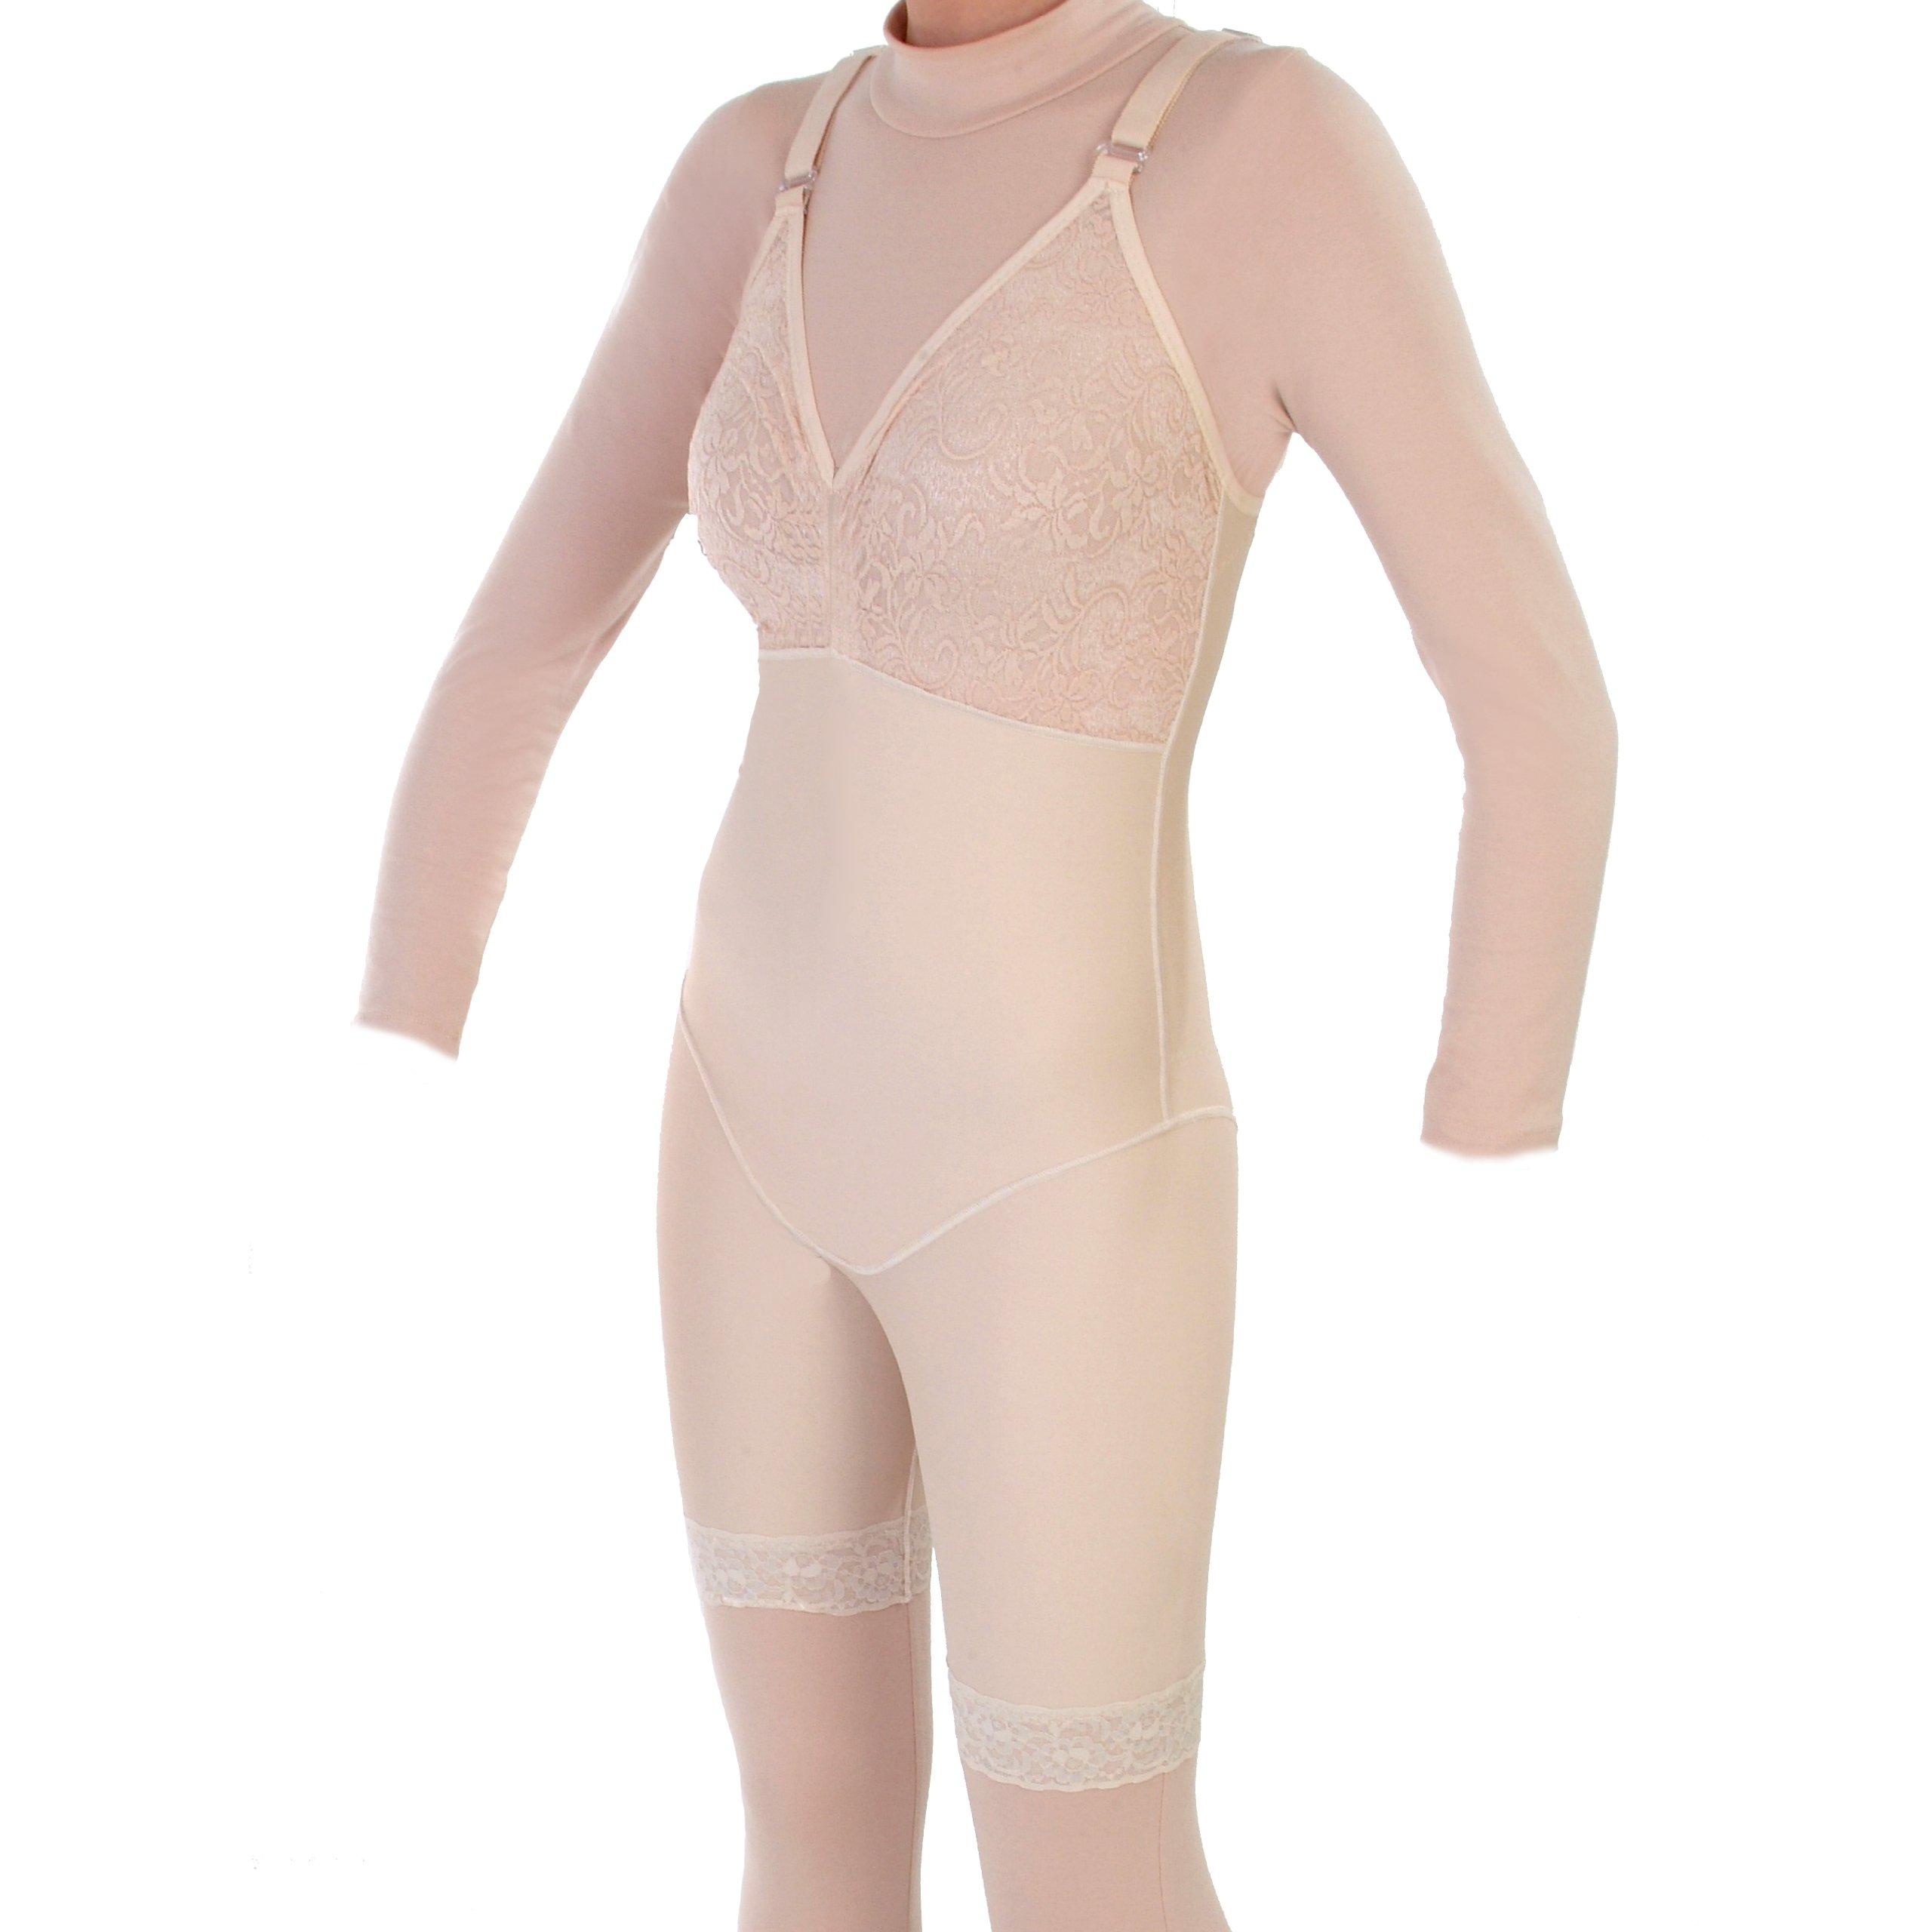 Style 27BNZ - Mid Thigh Shaper Bra Top No Zip by Contour | Compression Garments | ContourMD (Medium, Beige)